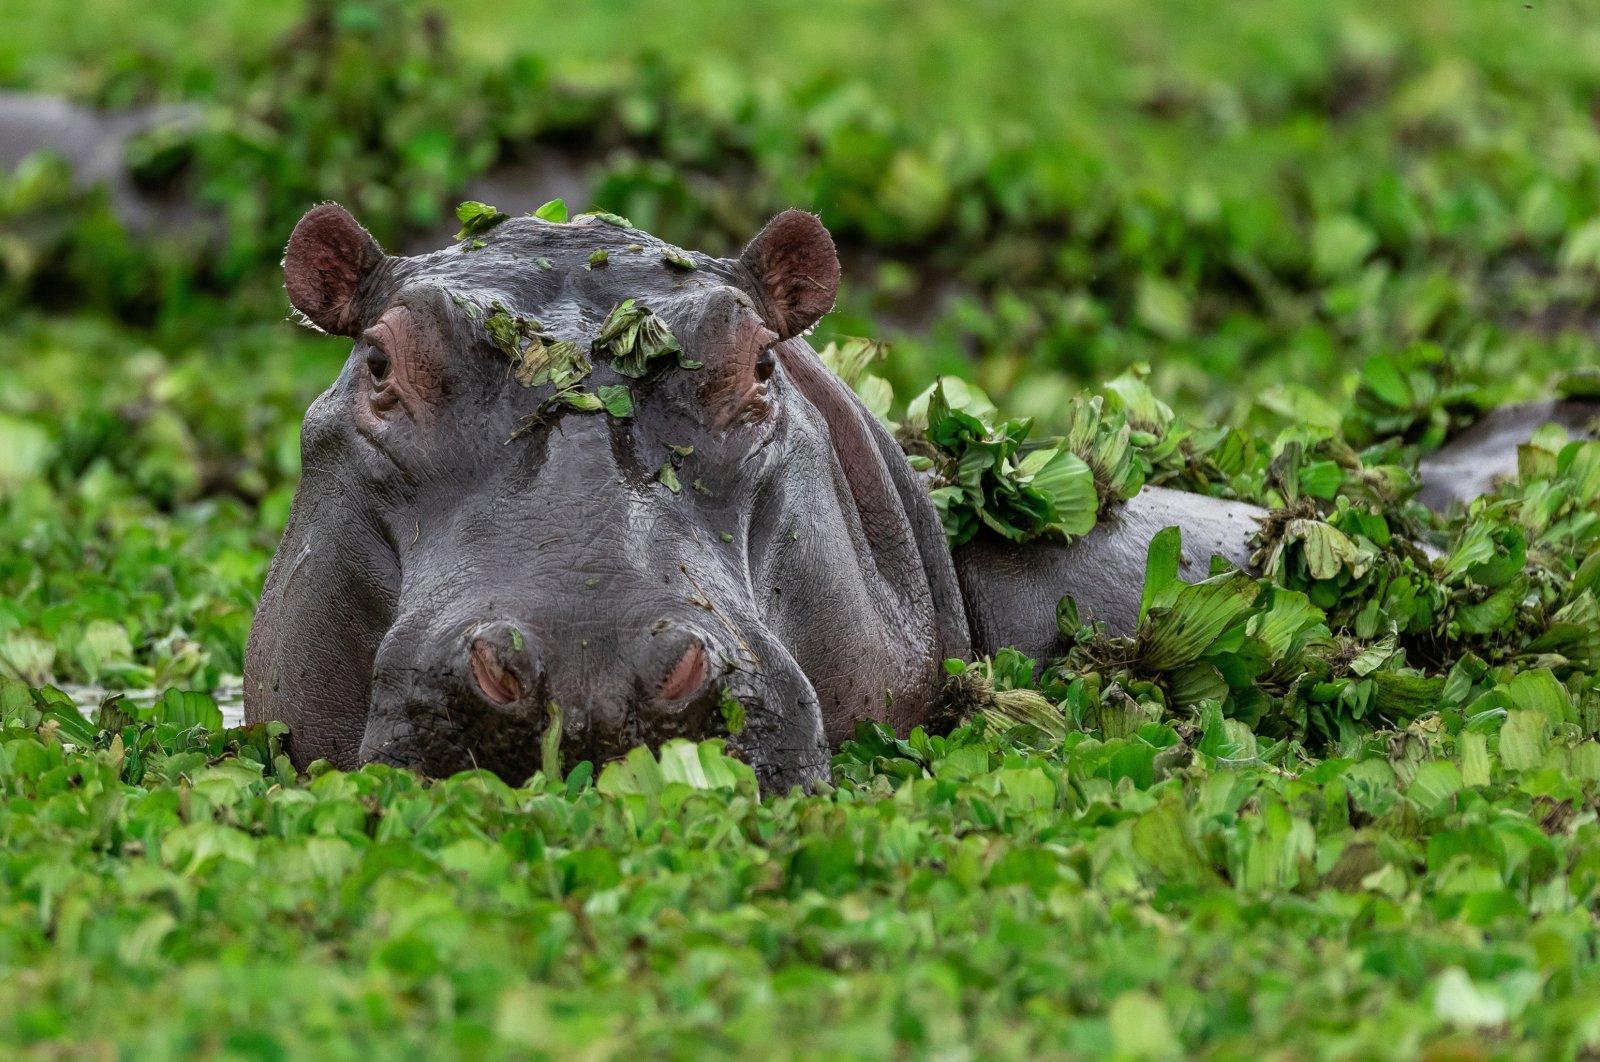 Hippopotamus in lake water. (Shutterstock File Photo)